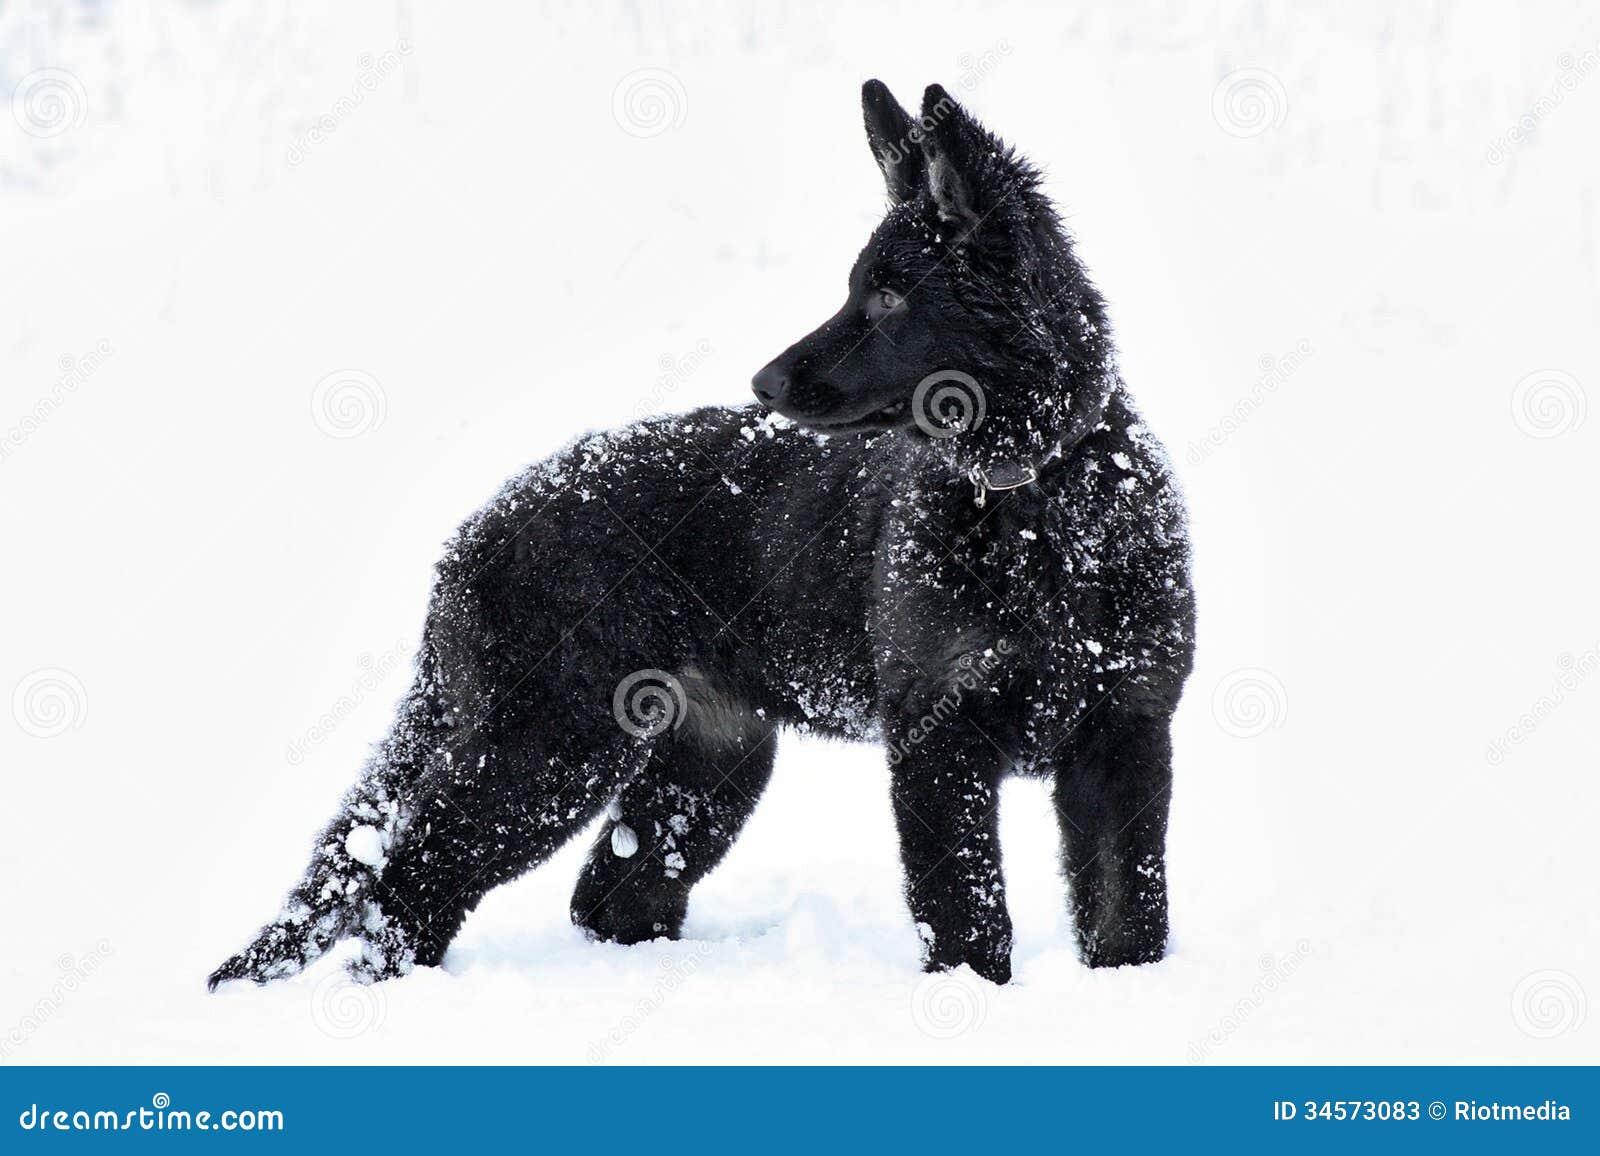 Black Dog In The Snow Stock Image Image Of Winter Black 34573083